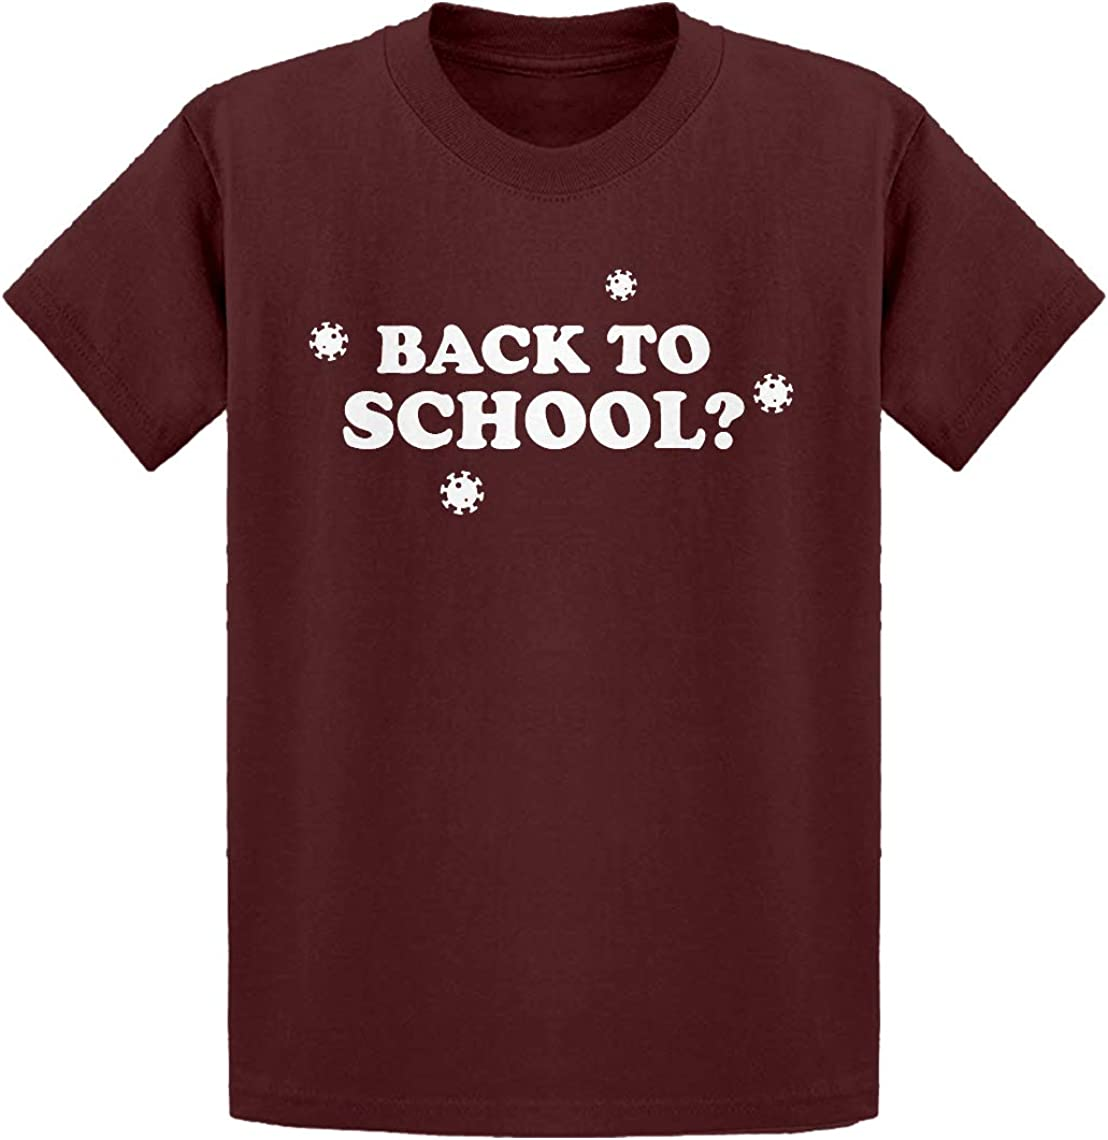 Indica Plateau Back to School? Kids T-Shirt